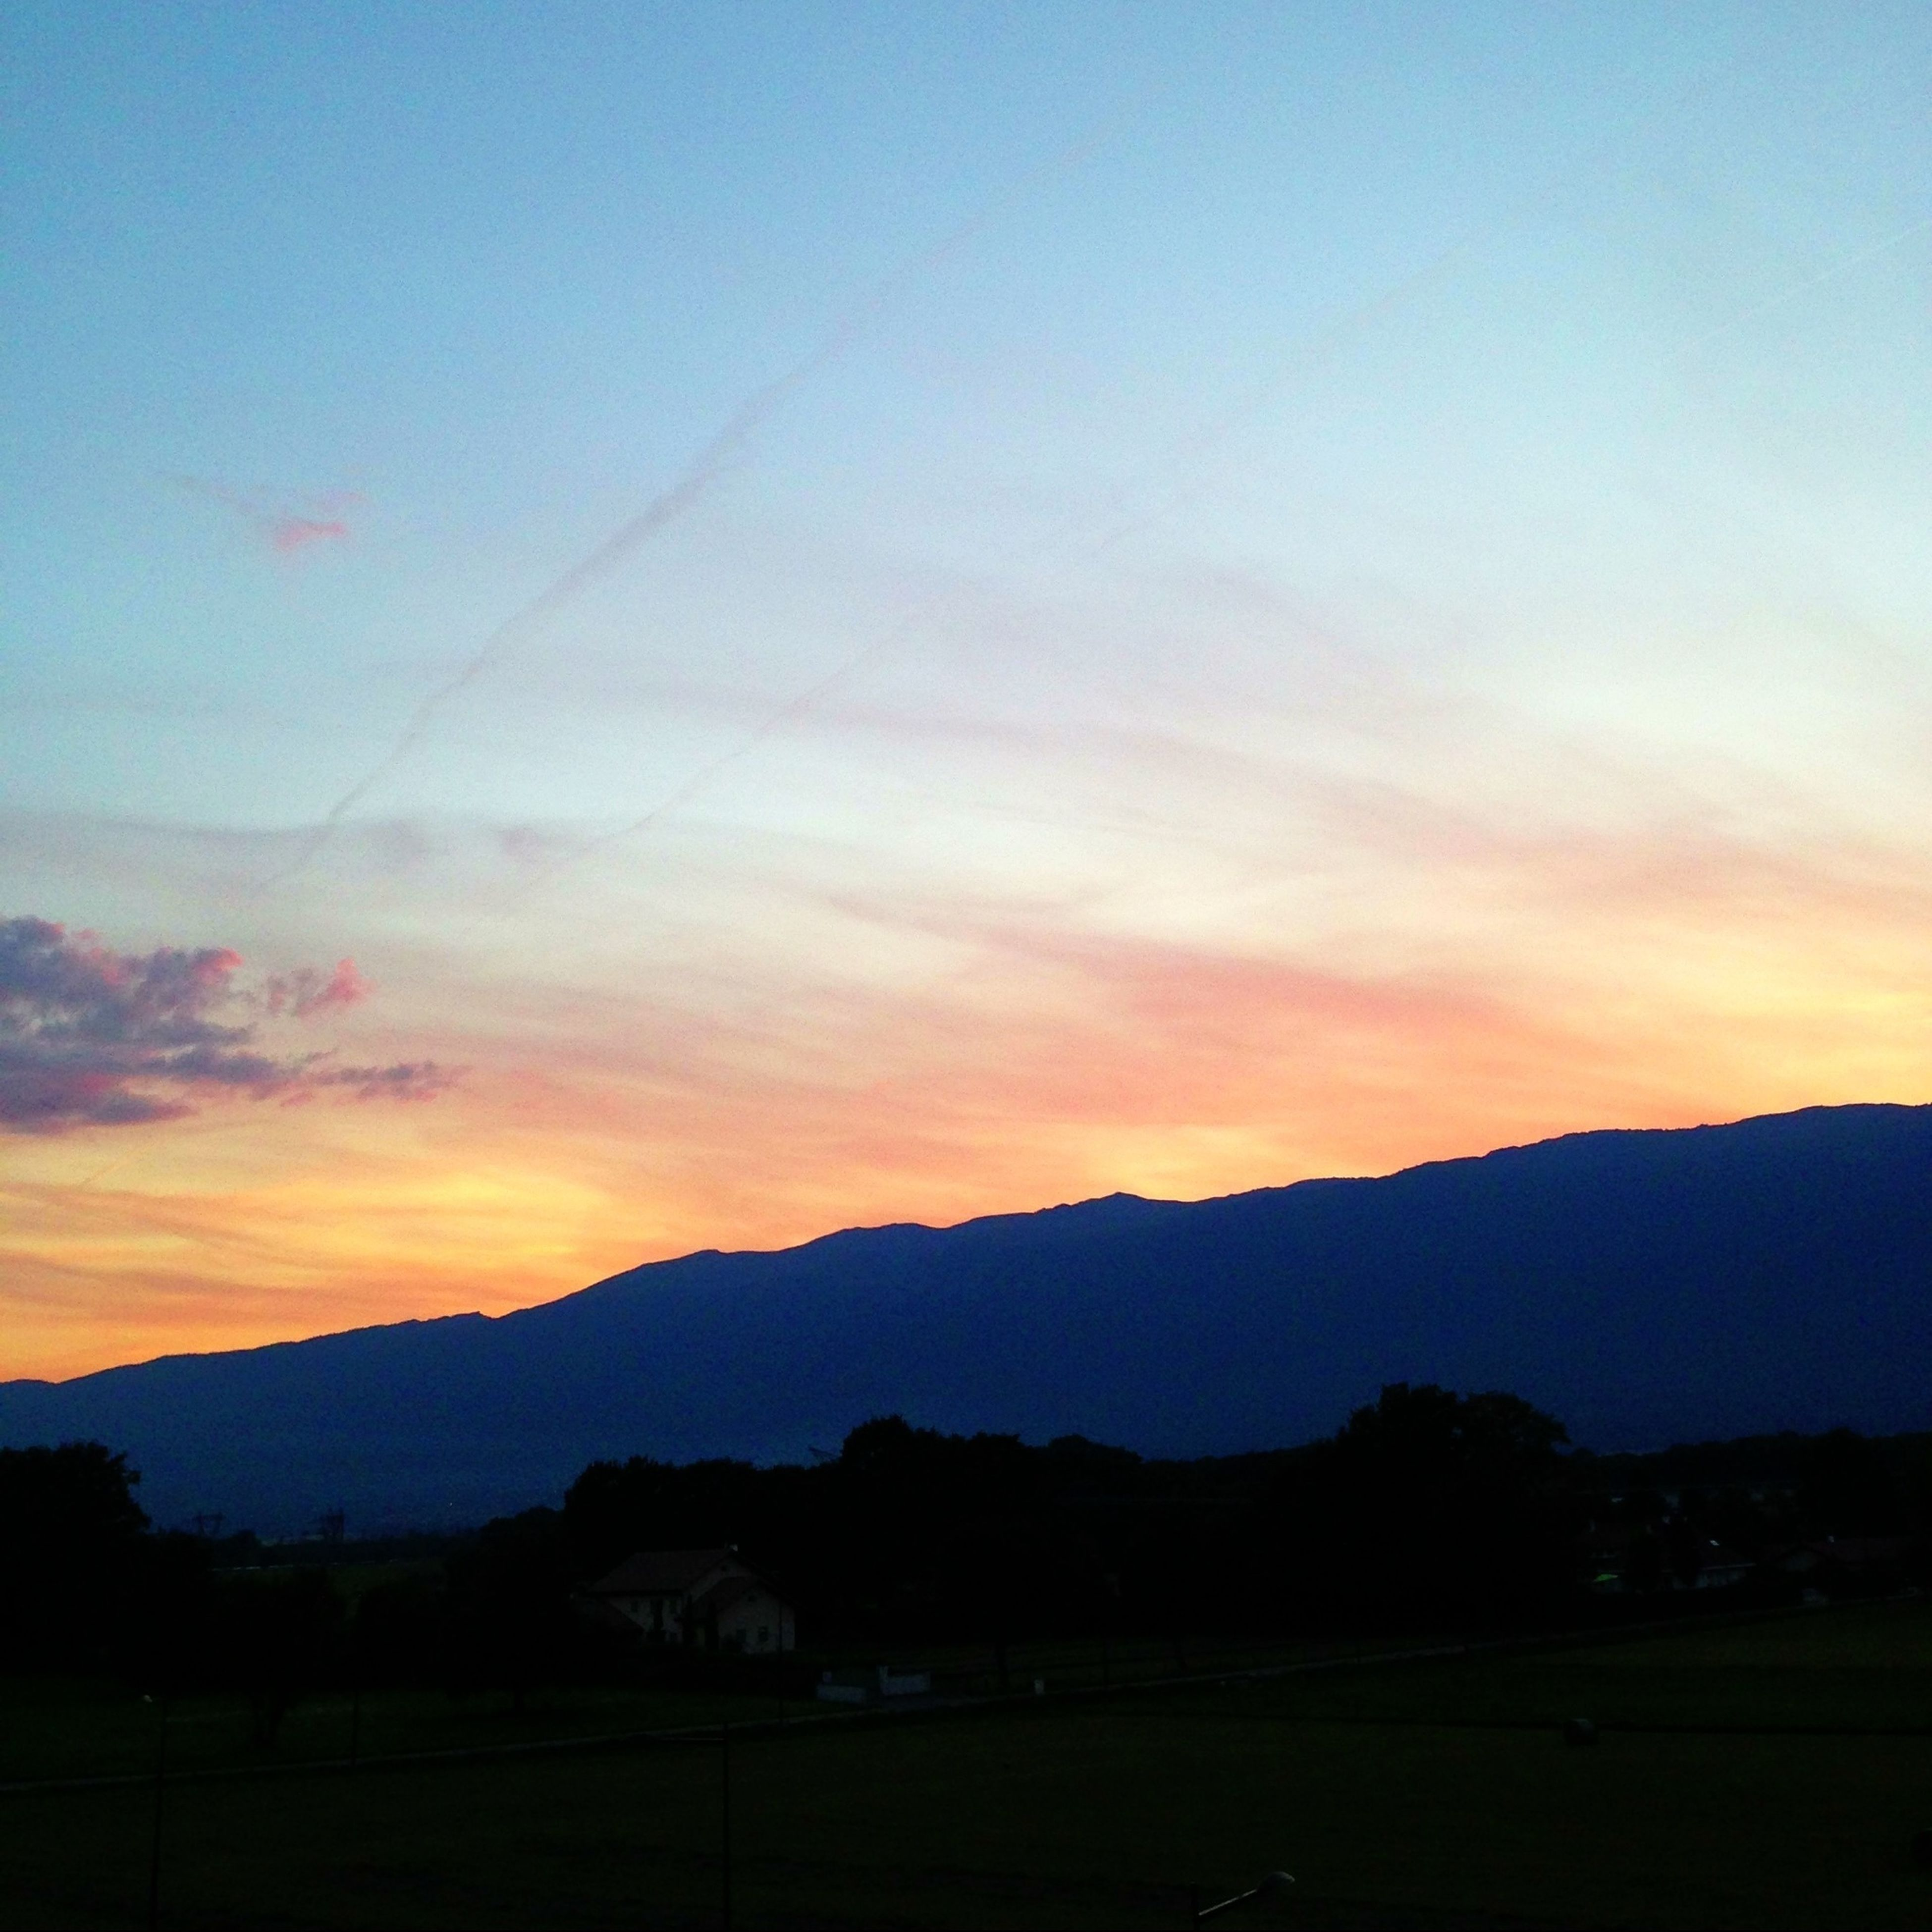 mountain, scenics, tranquil scene, sunset, landscape, mountain range, tranquility, beauty in nature, silhouette, sky, nature, idyllic, non-urban scene, tree, dusk, orange color, remote, outdoors, majestic, cloud